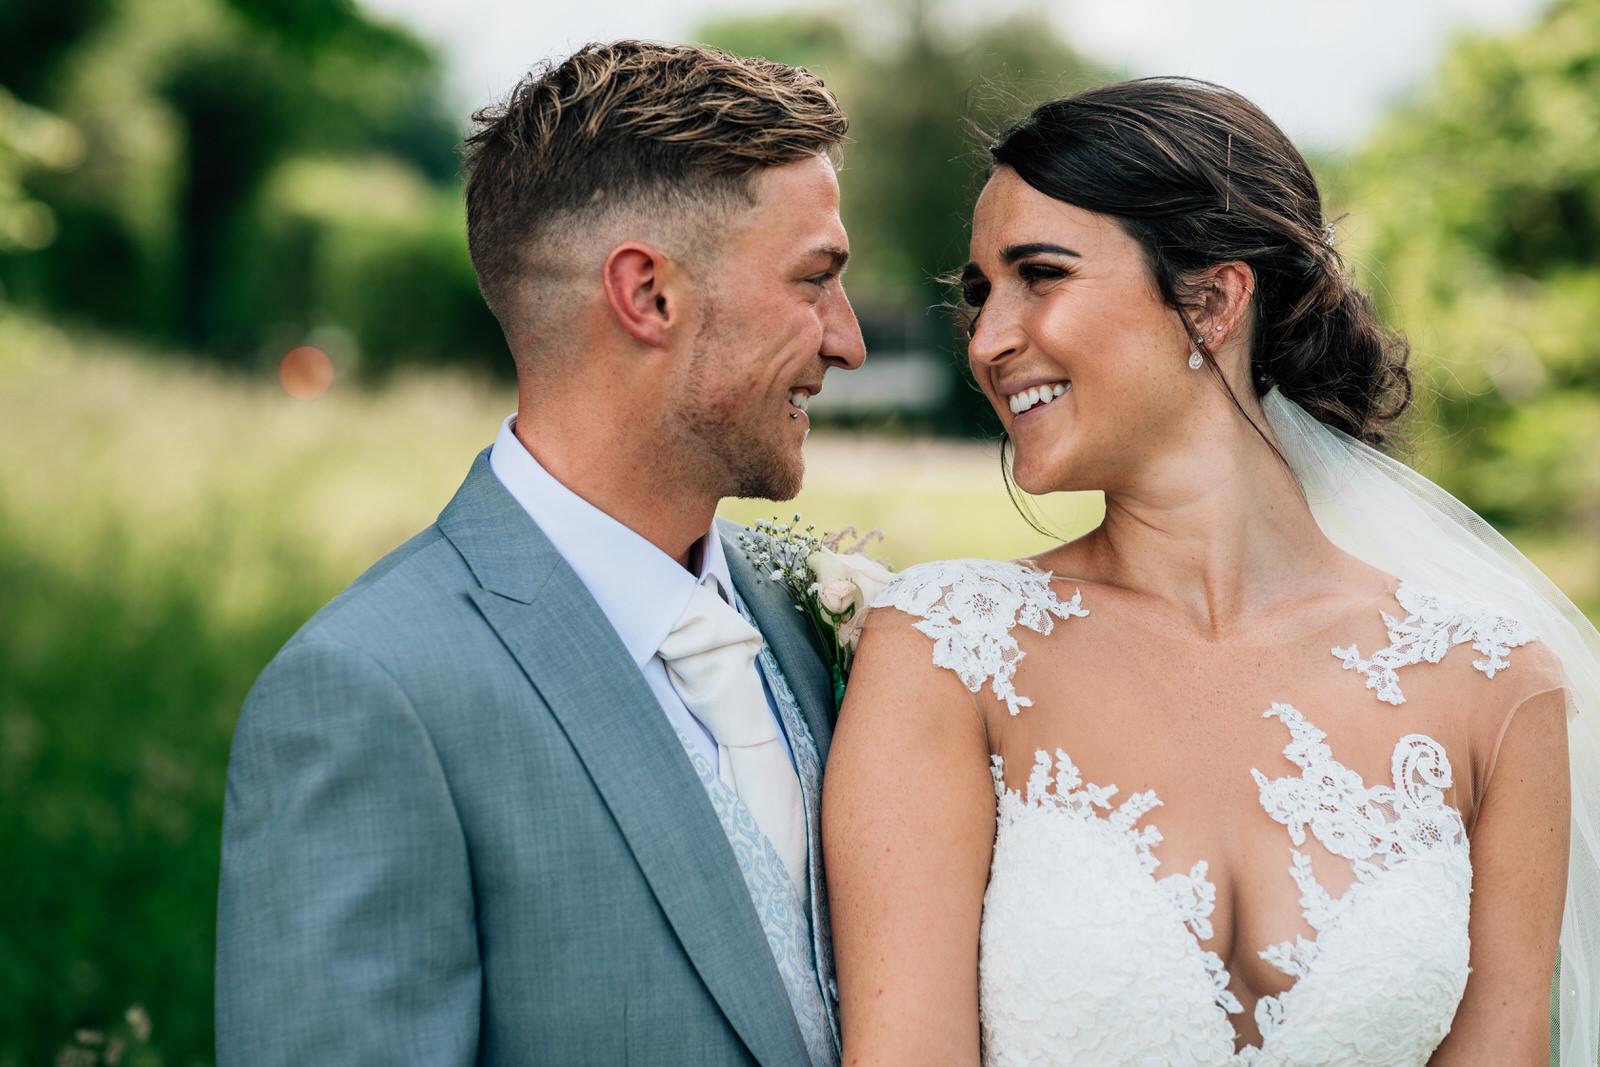 Home counties wedding photography by Damion Mower on English-Wedding.com (9)